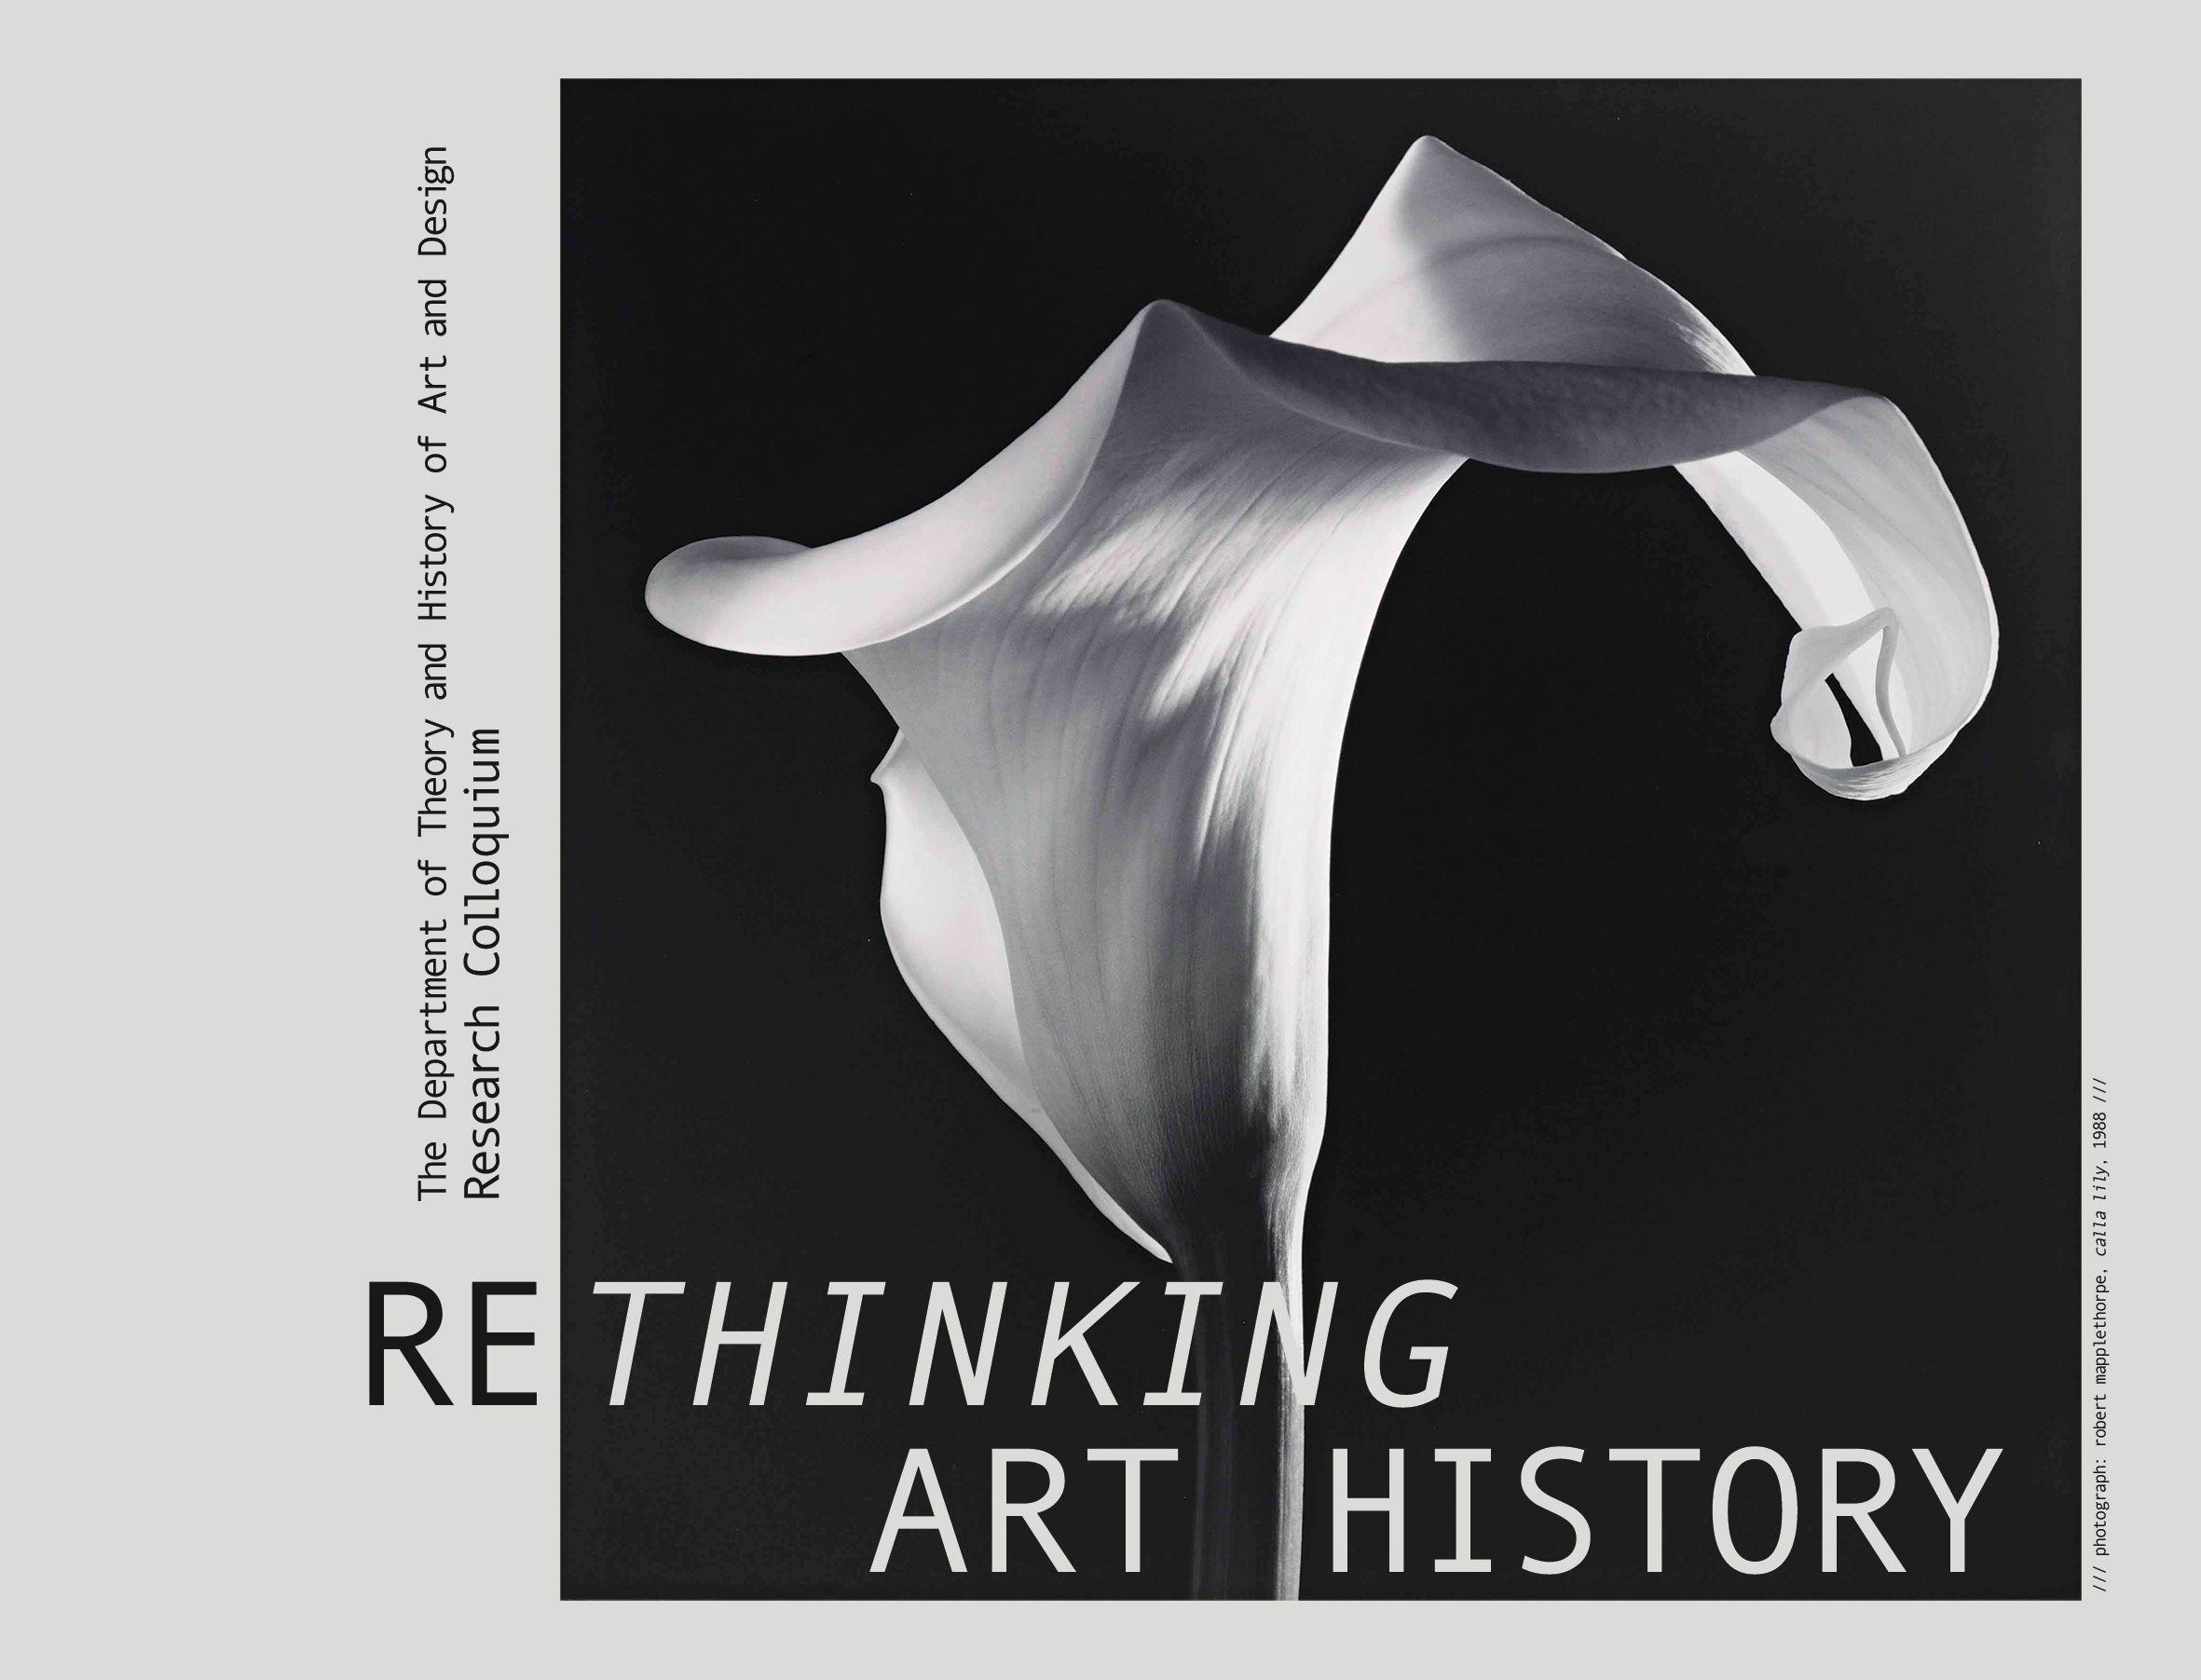 RethinkingArtHistoryPoster.jpg